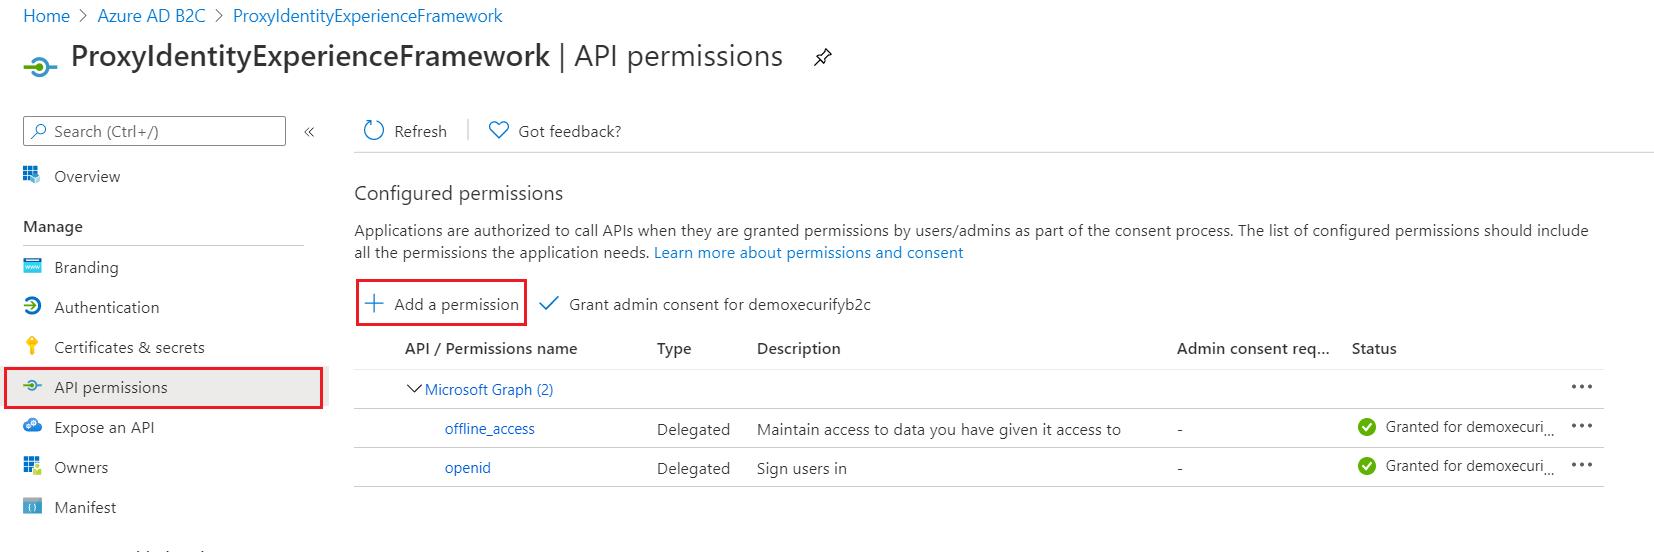 SAML Single Sign-On (SSO) using Azure B2C as Identity Provider (IdP),for SAML 2.0 Azure B2C, authentication